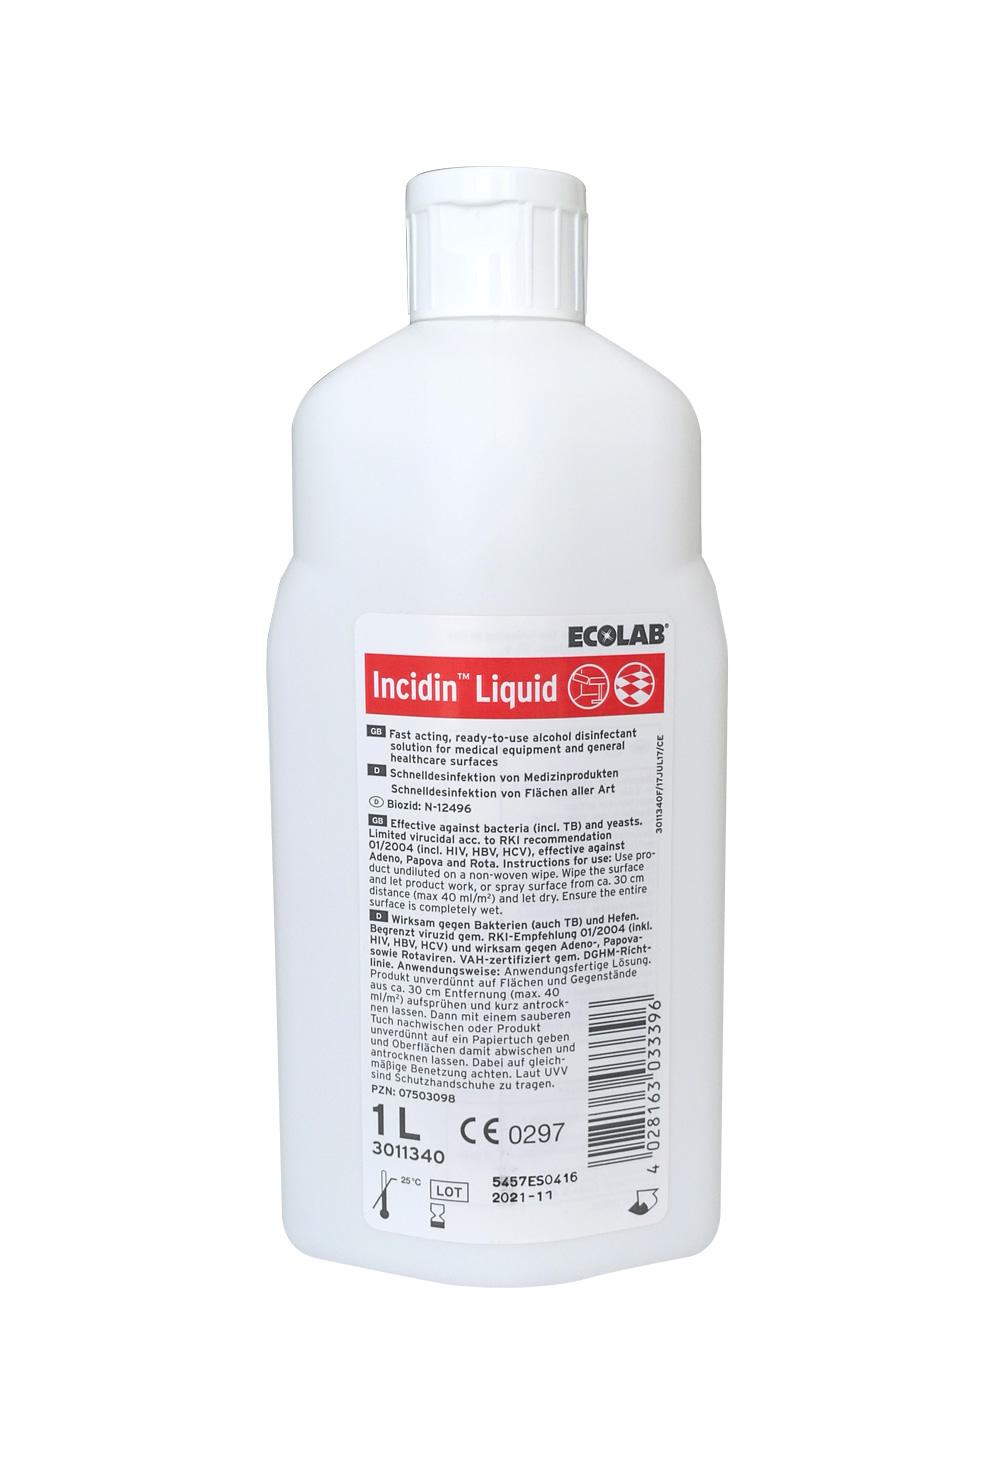 Incidin Liquid   Schnelldesinfektion für Flächen   1 l